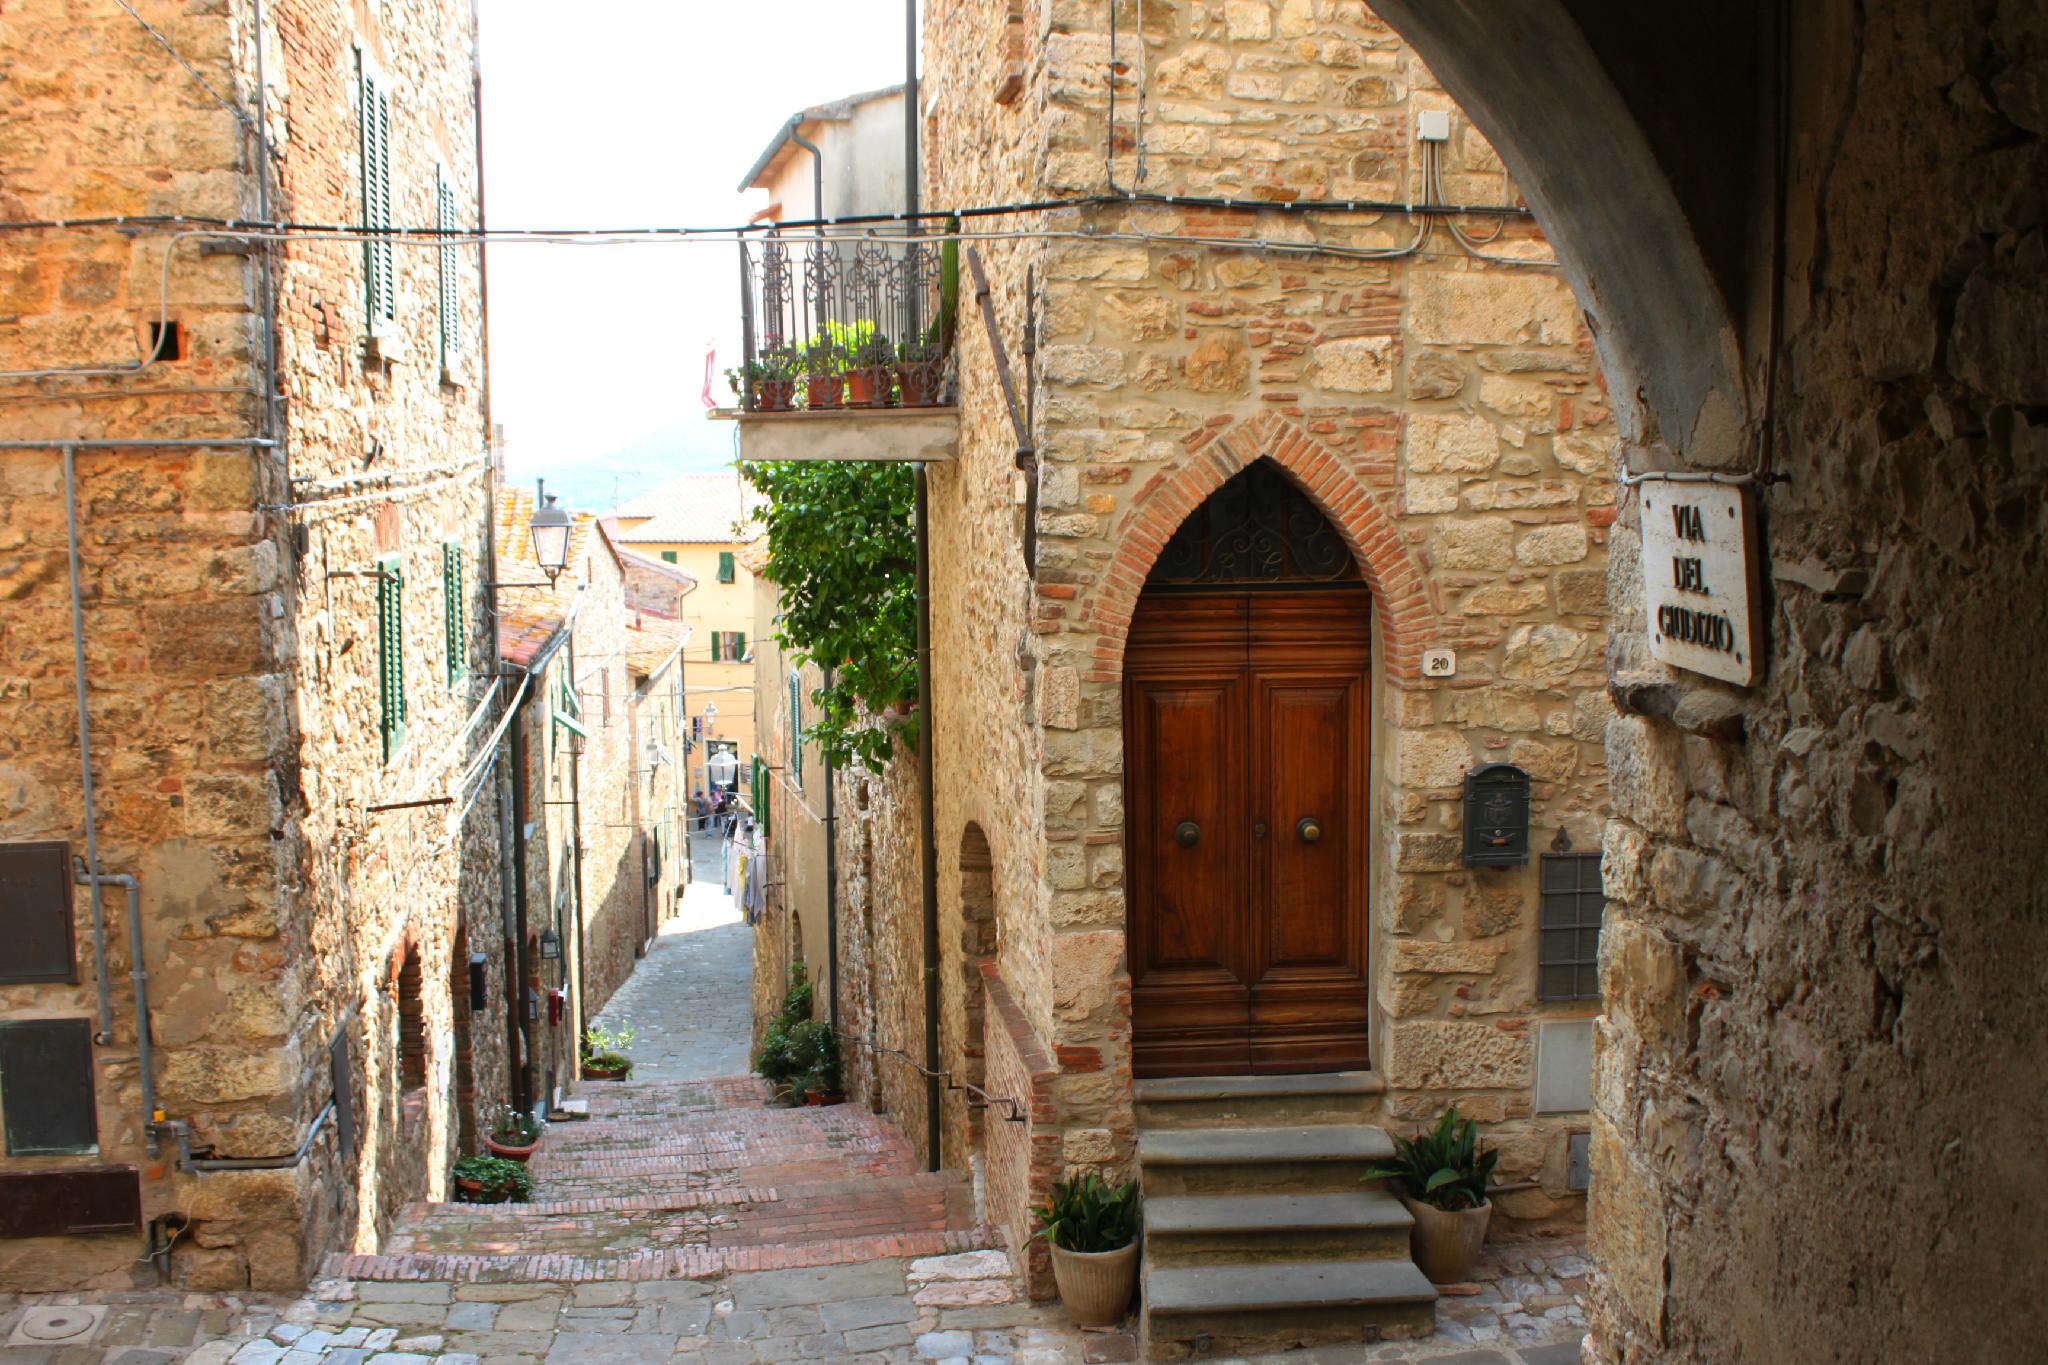 vakantie tips Toscane Maremma van Italian Residence